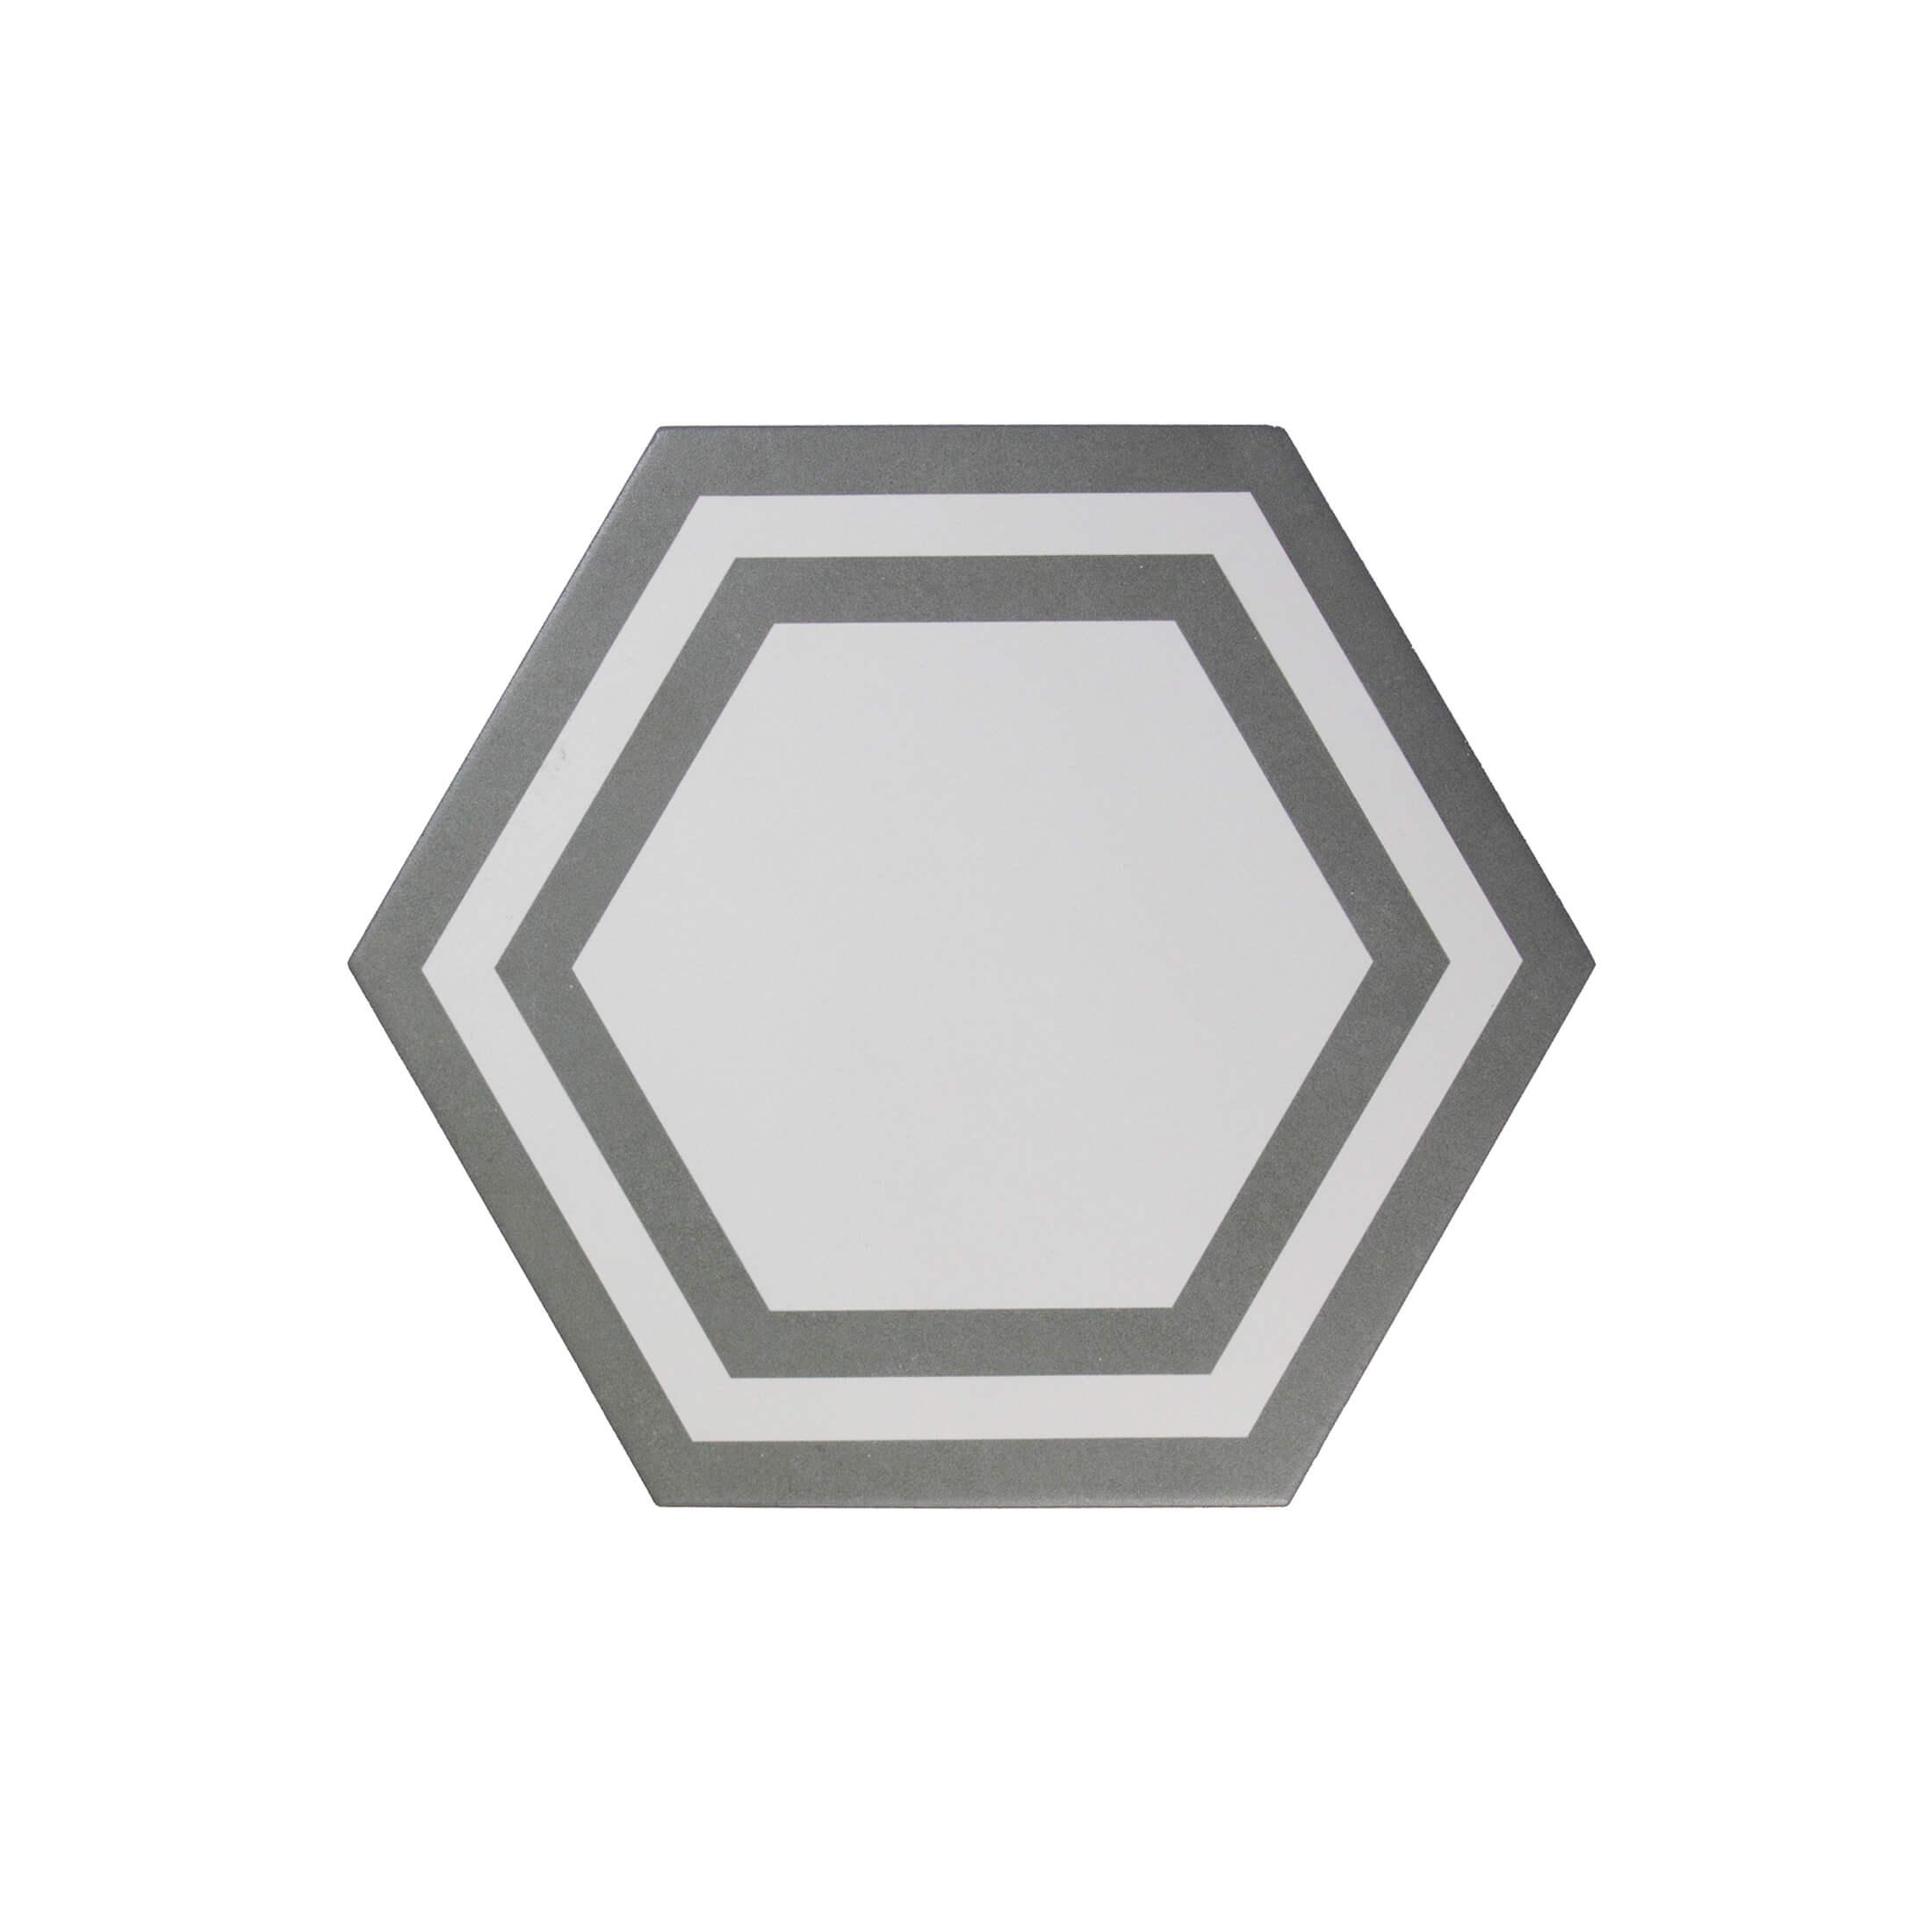 ADPV9018 - PAVIMENTO DECO DARK GRAY - 20 cm X 2,3 cm